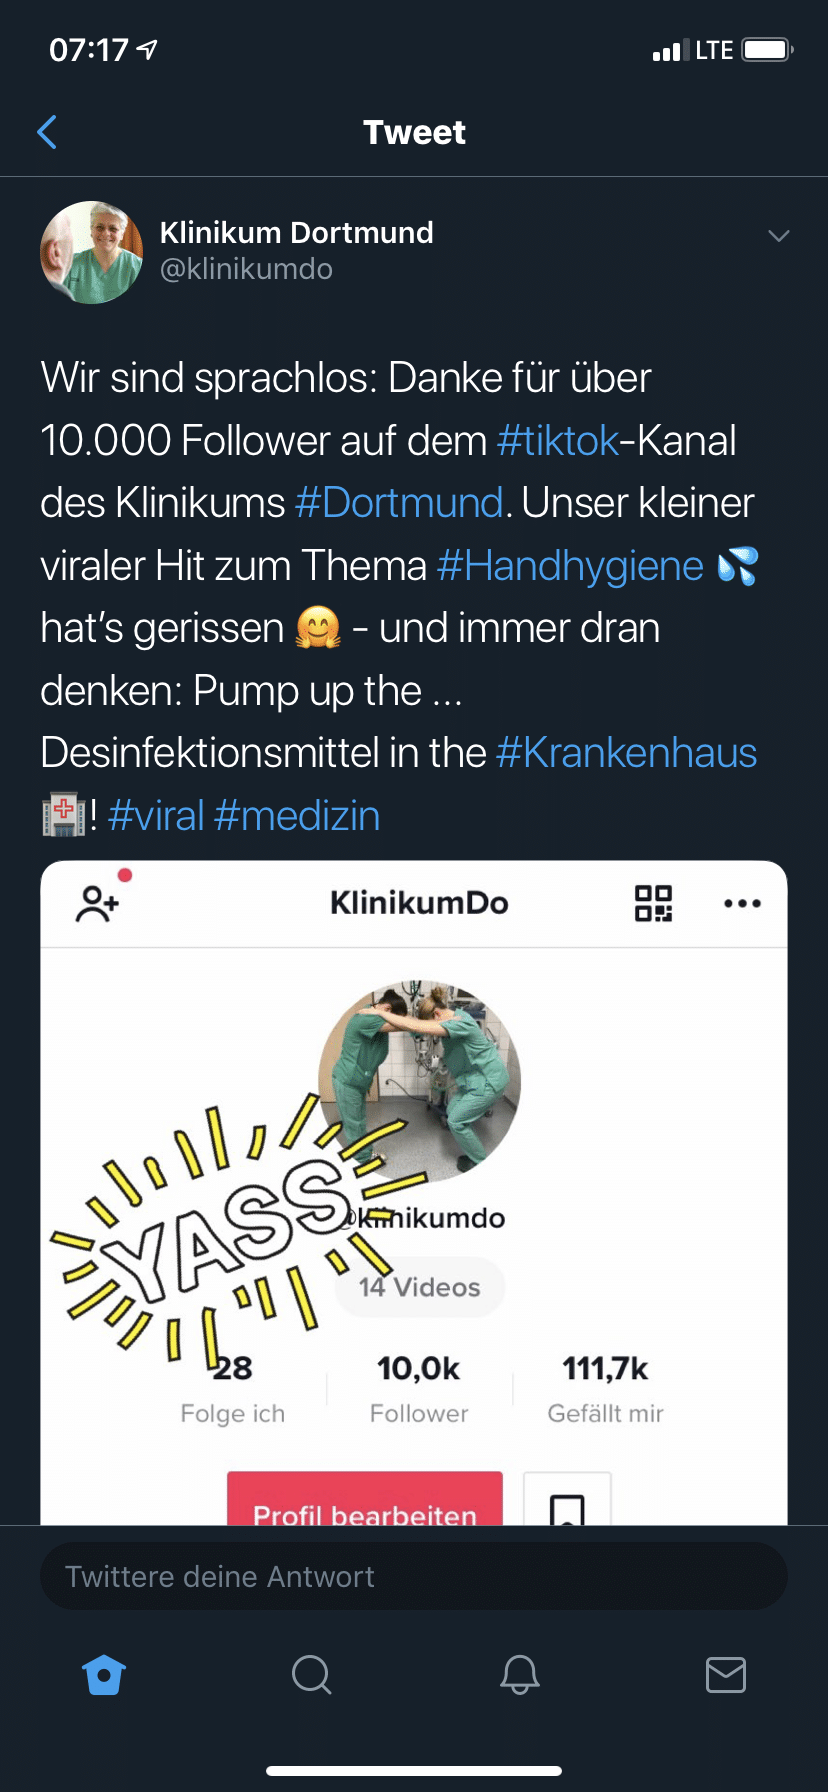 Tweet Klinikum Dortmund zu TikTok Kampagne